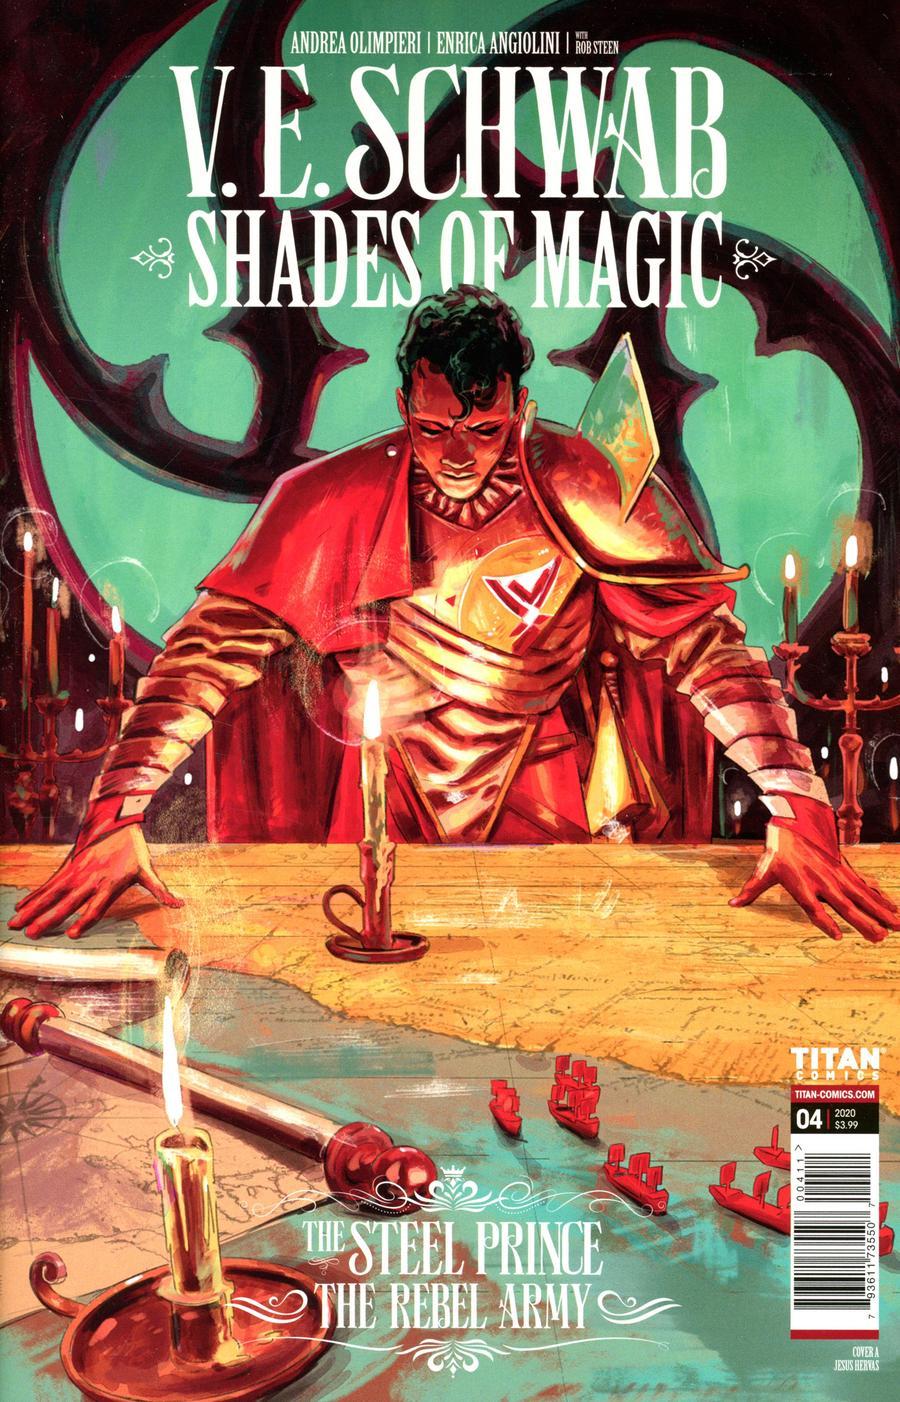 Shades Of Magic Steel Prince Rebel Army #4